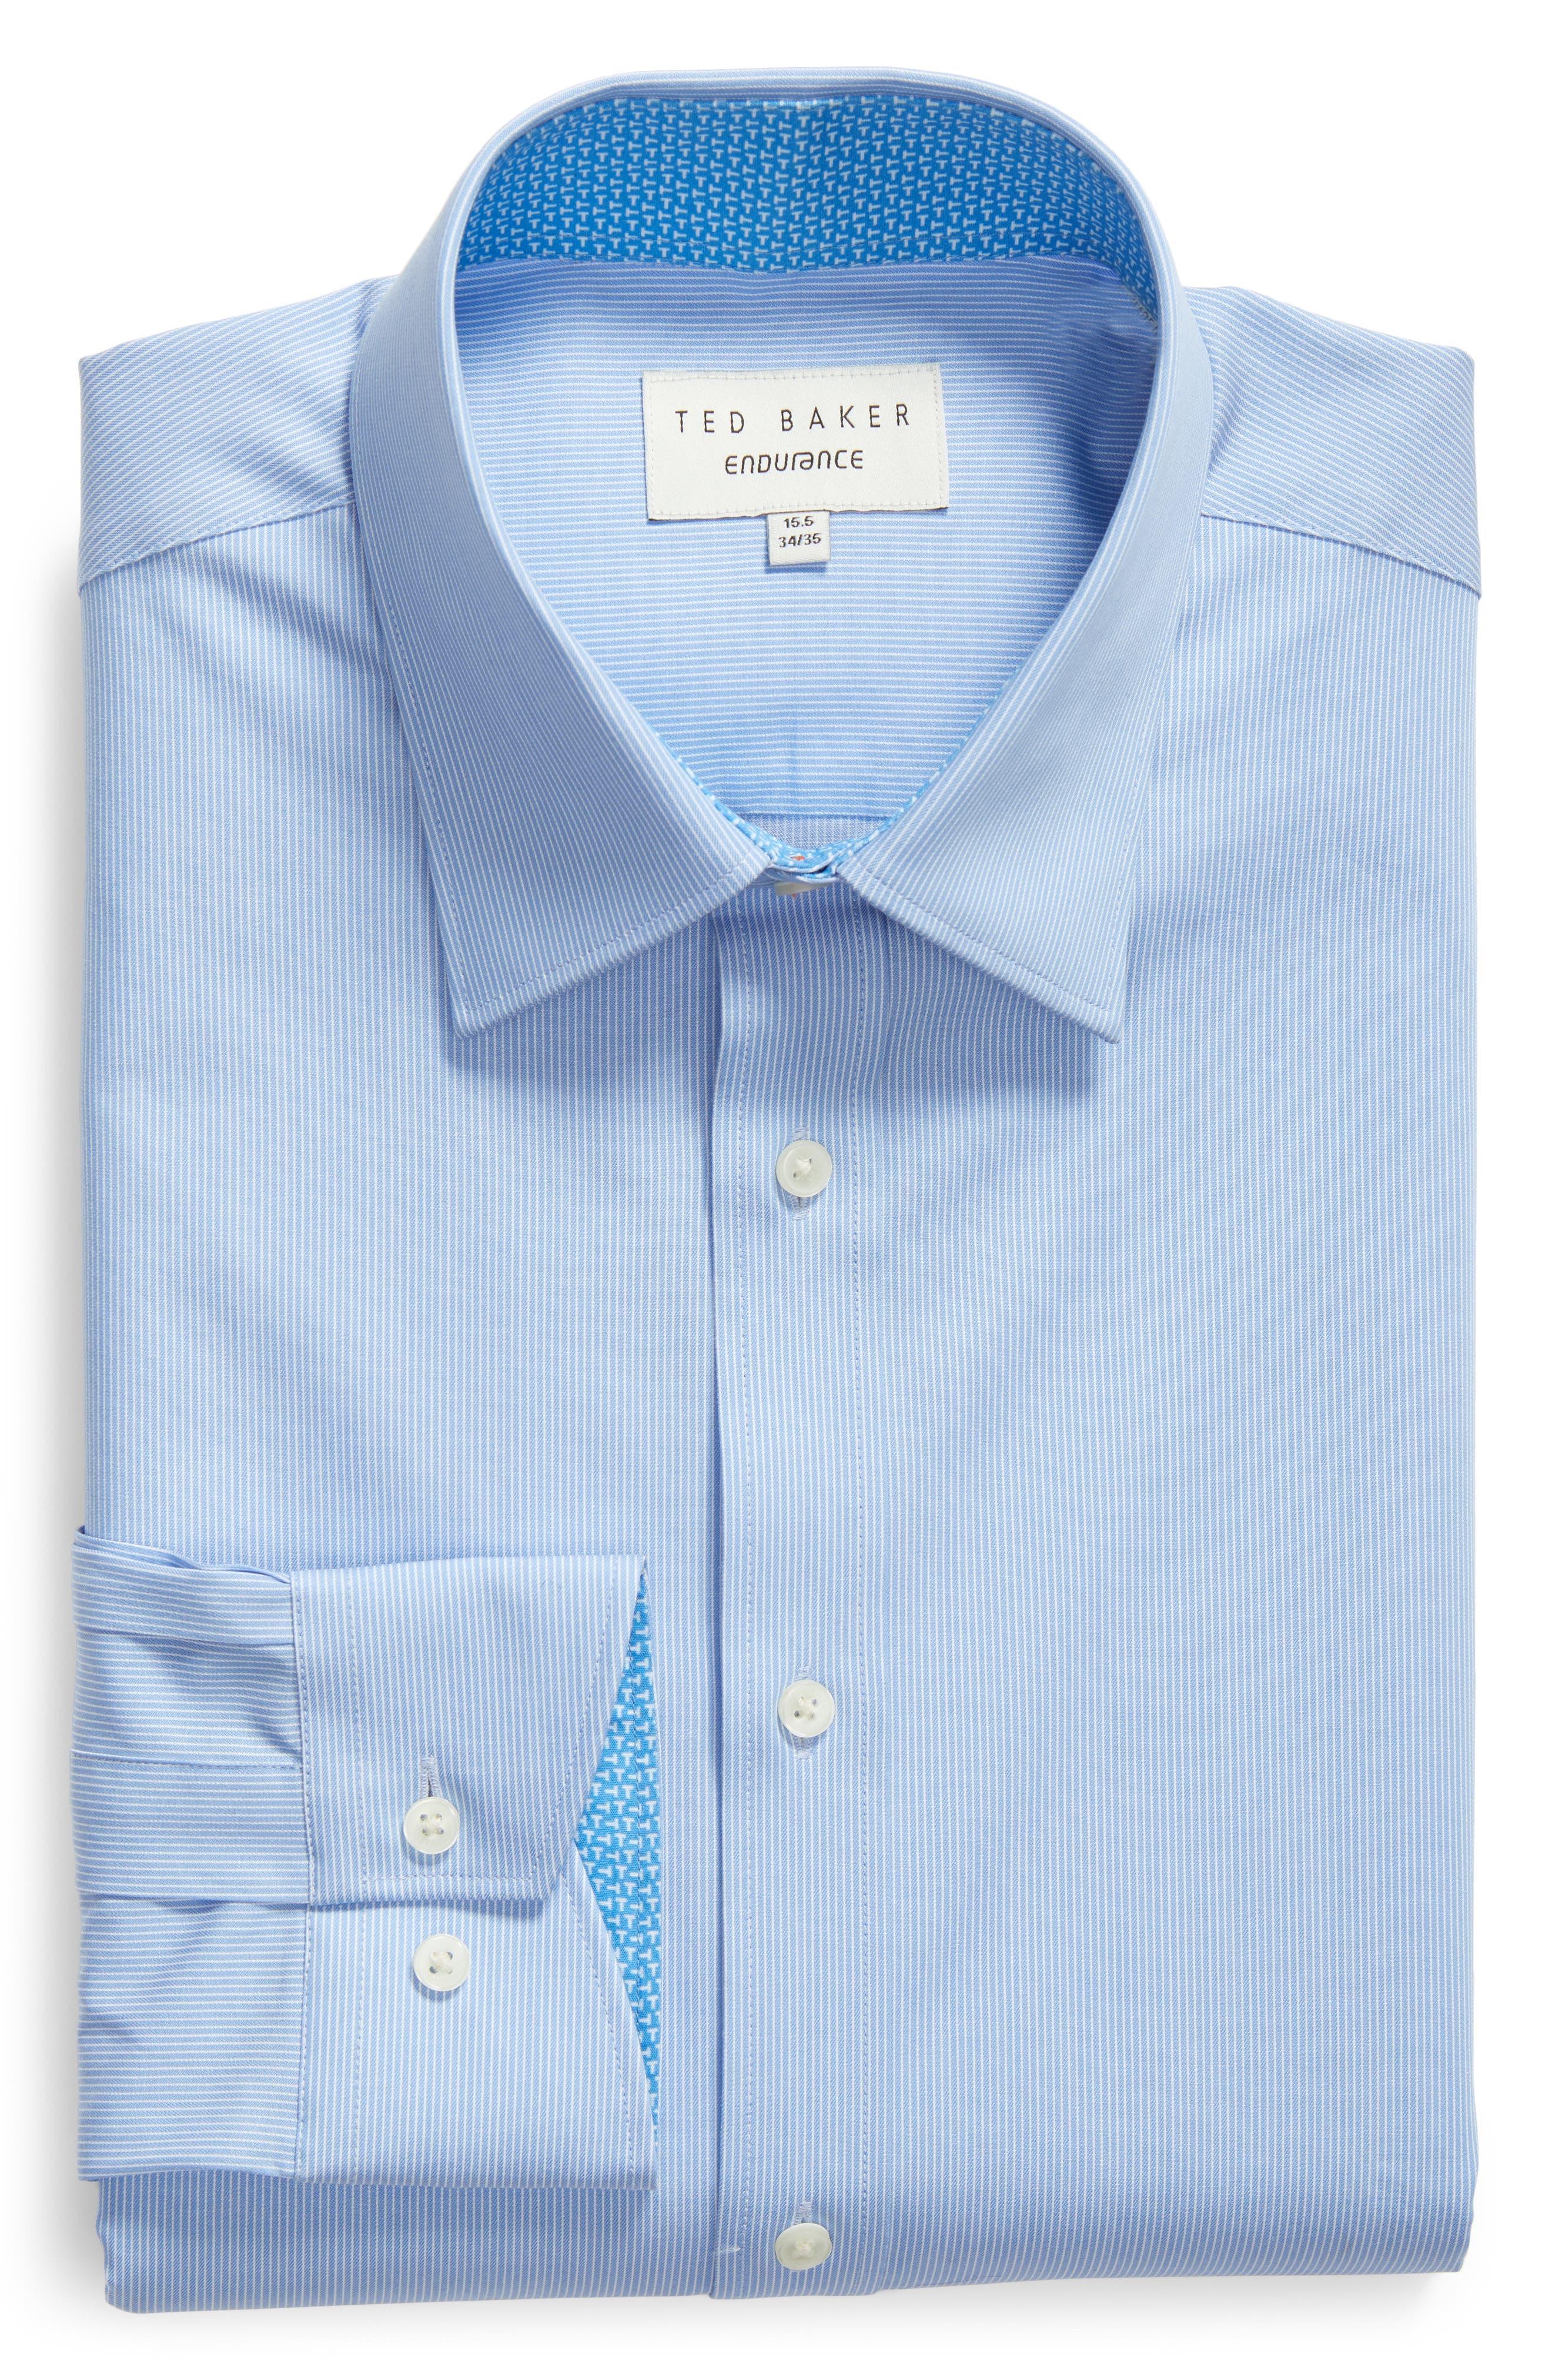 Nickoe Trim Fit Dress Shirt,                             Alternate thumbnail 5, color,                             BLUE